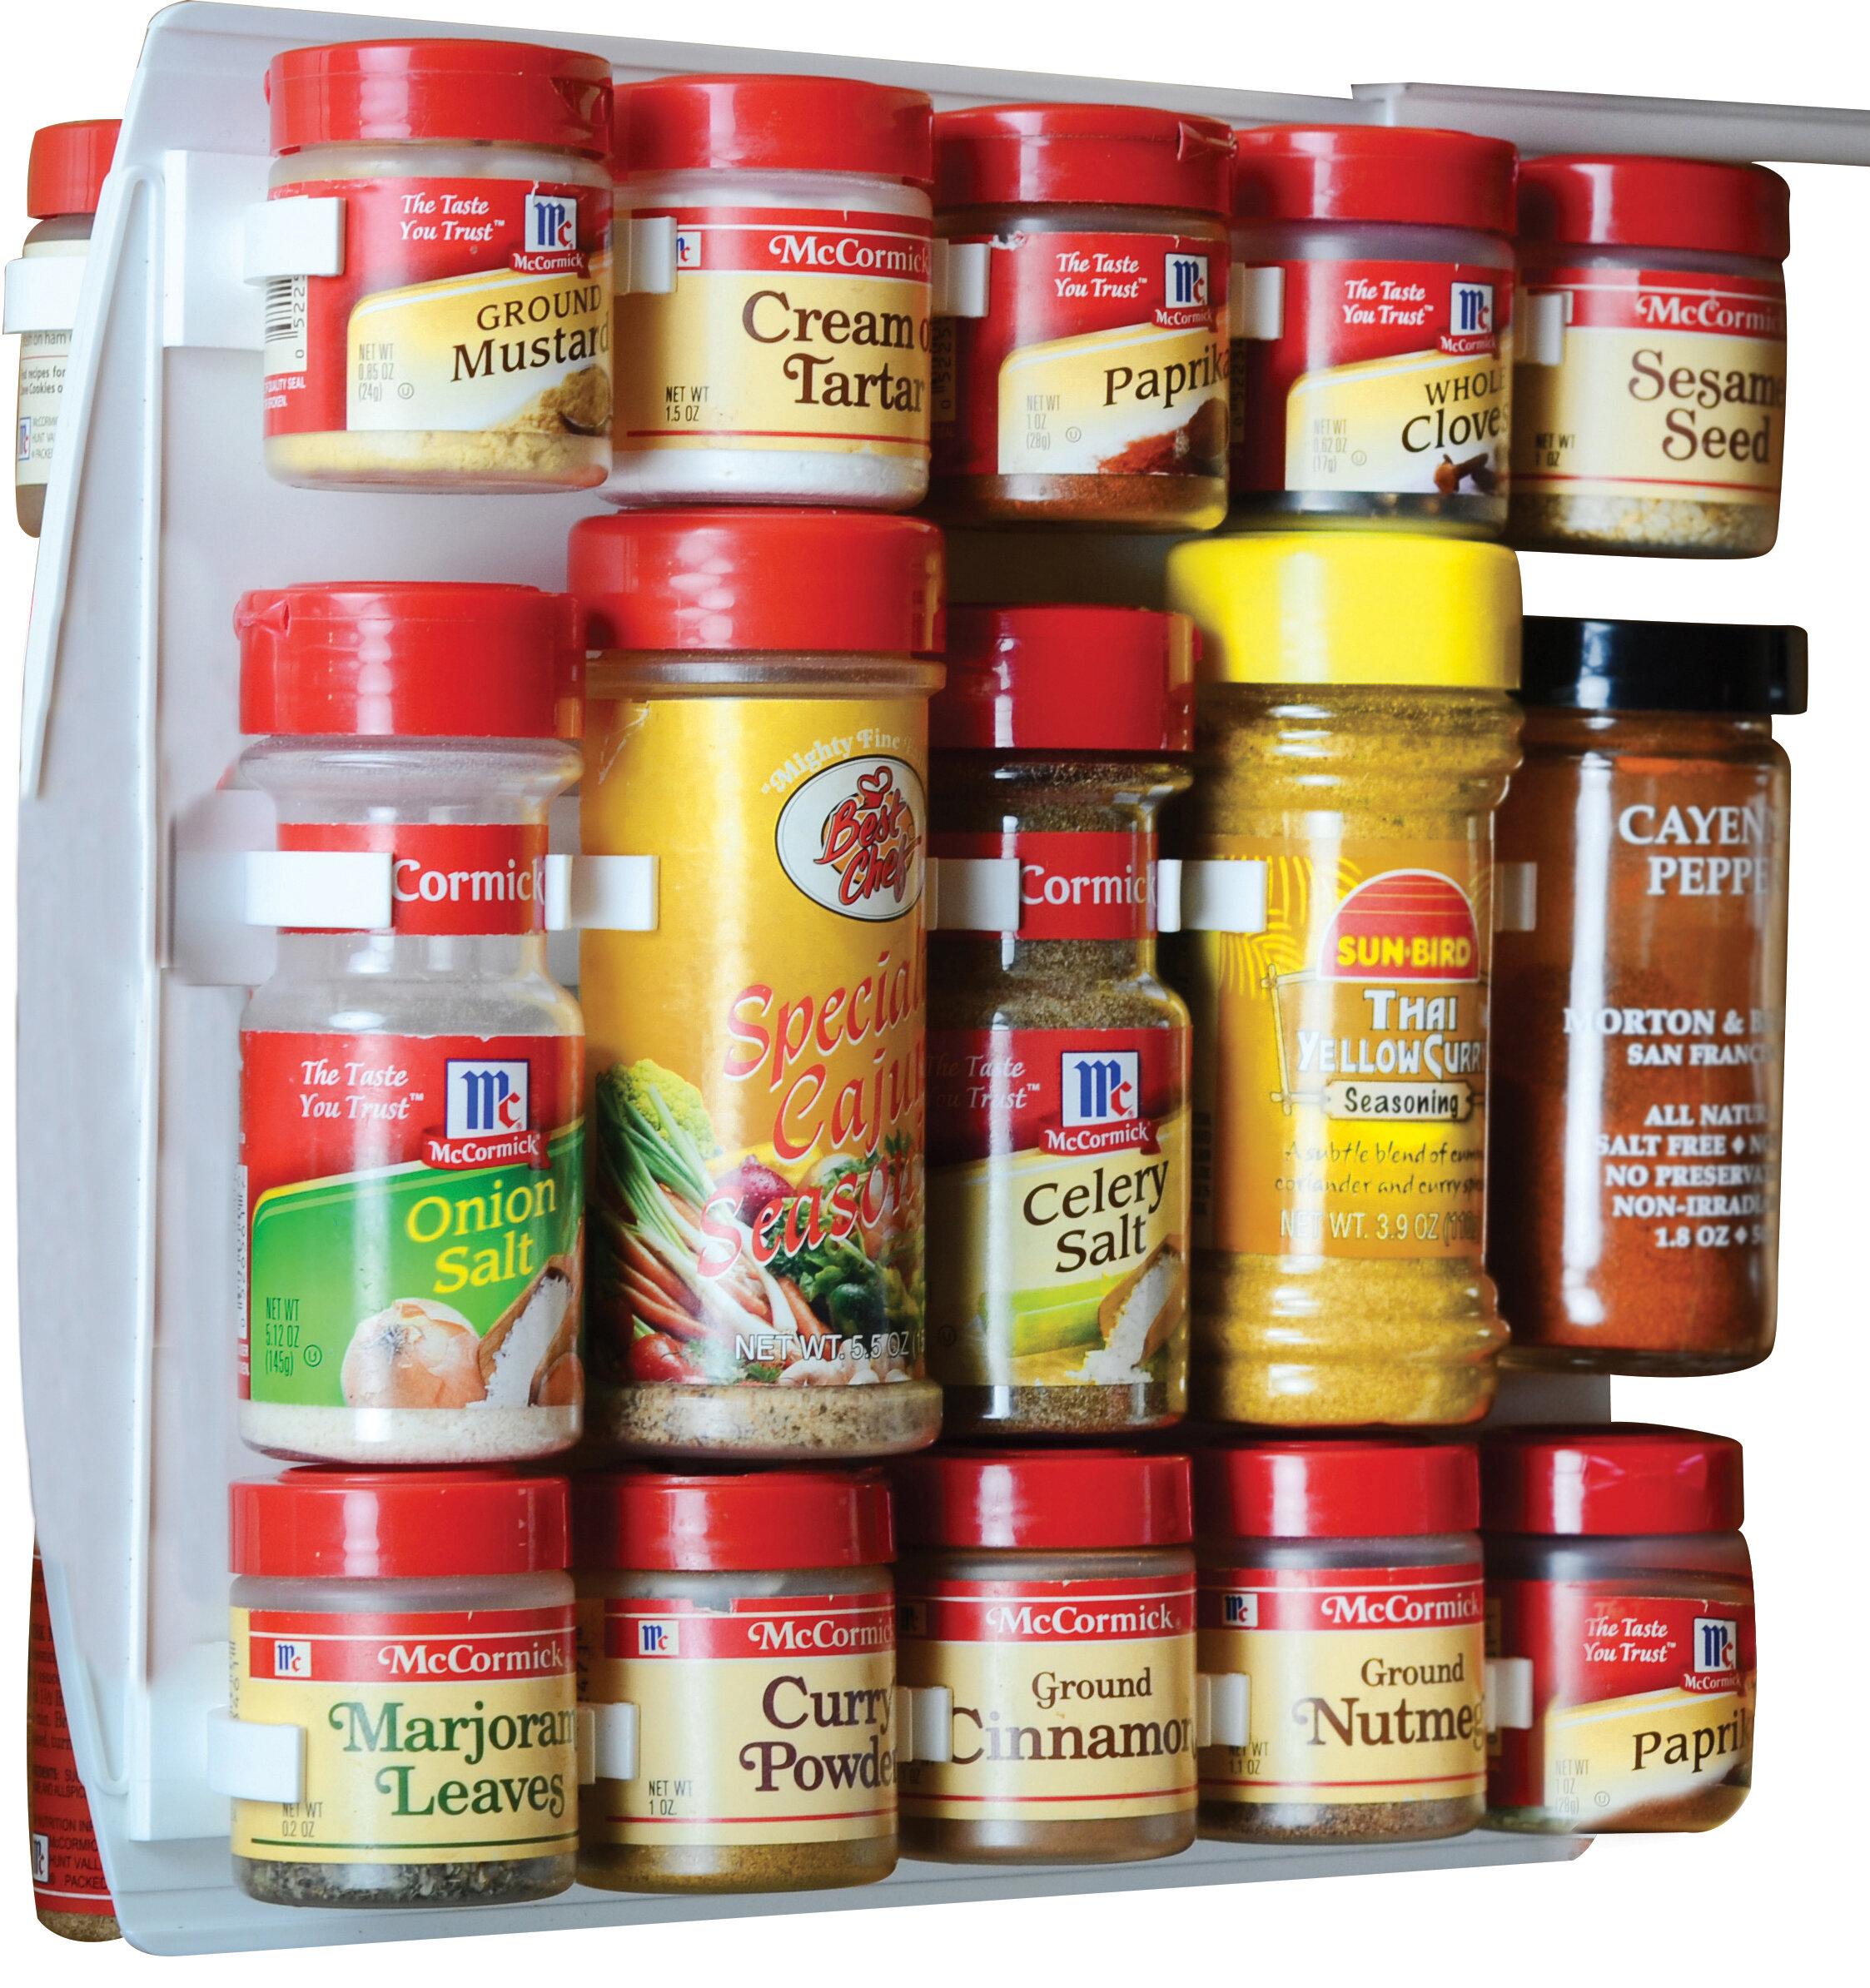 NEW SpiceStor Organizer Spice Rack 20 Clip 10 x 5 FREE SHIPPING